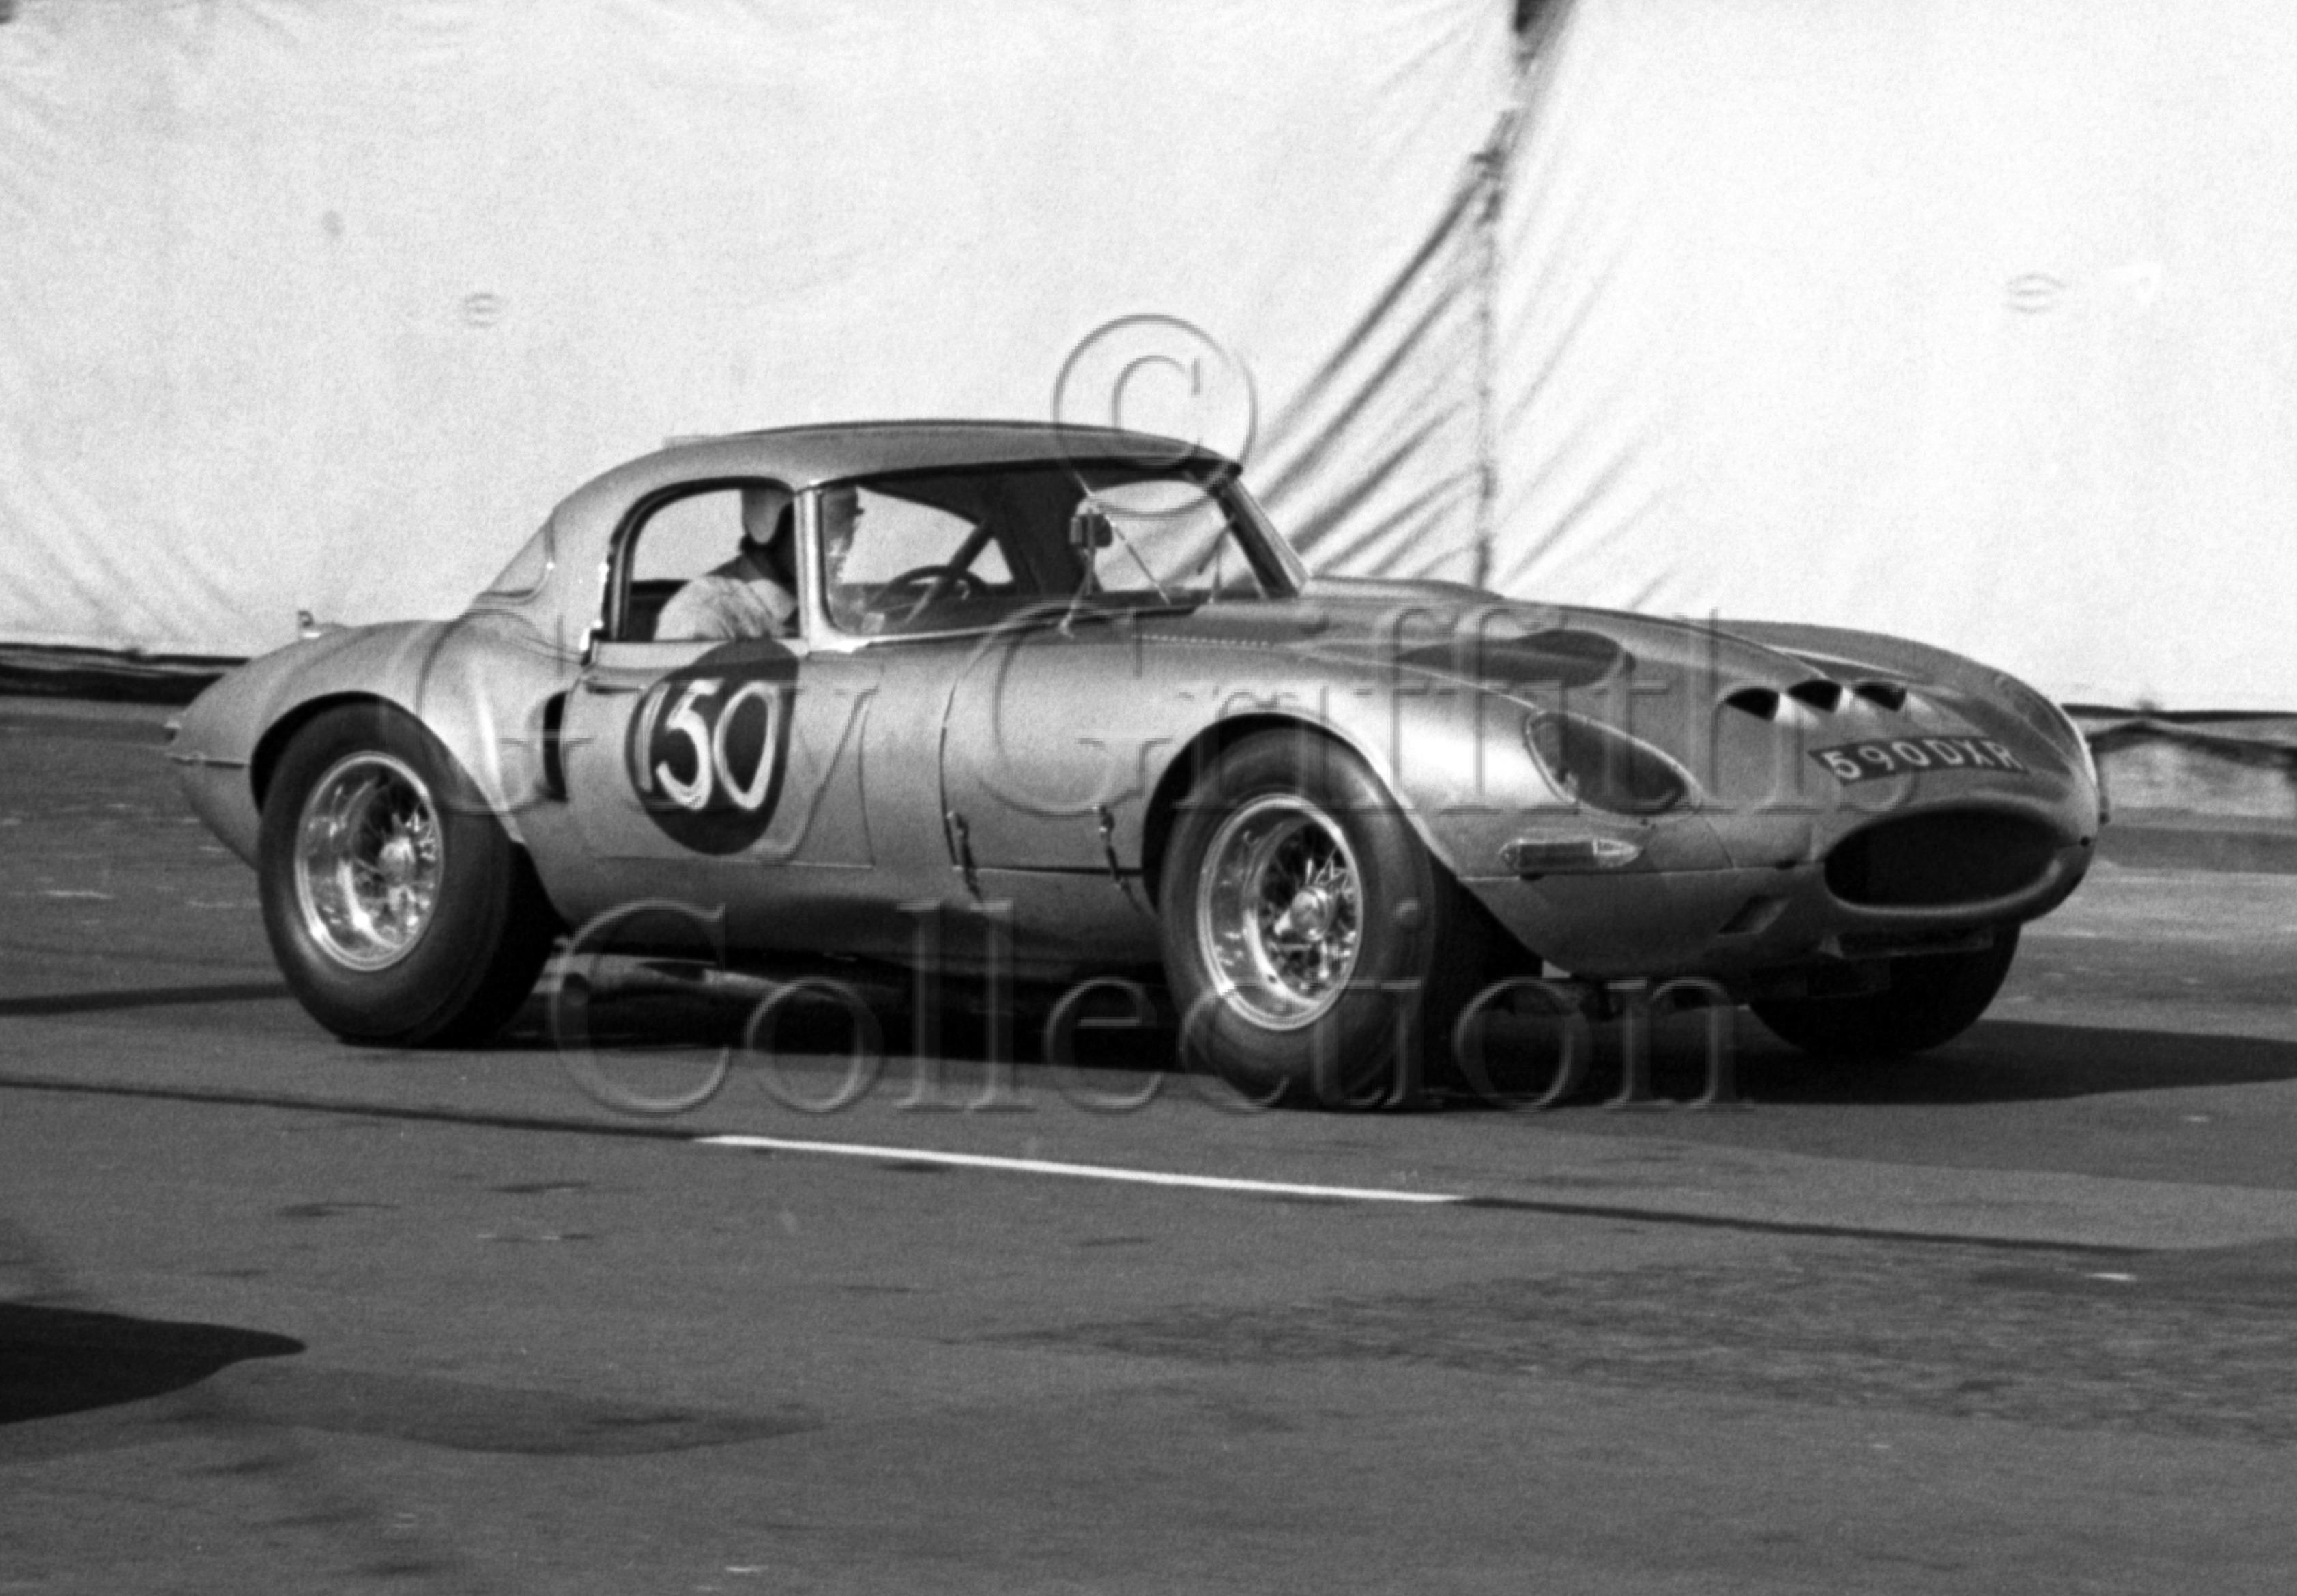 103-474–G-Richardson–Jaguar-Egal-590-DXR–Brighton–17-09-1966.jpg - Guy Griffiths Collection